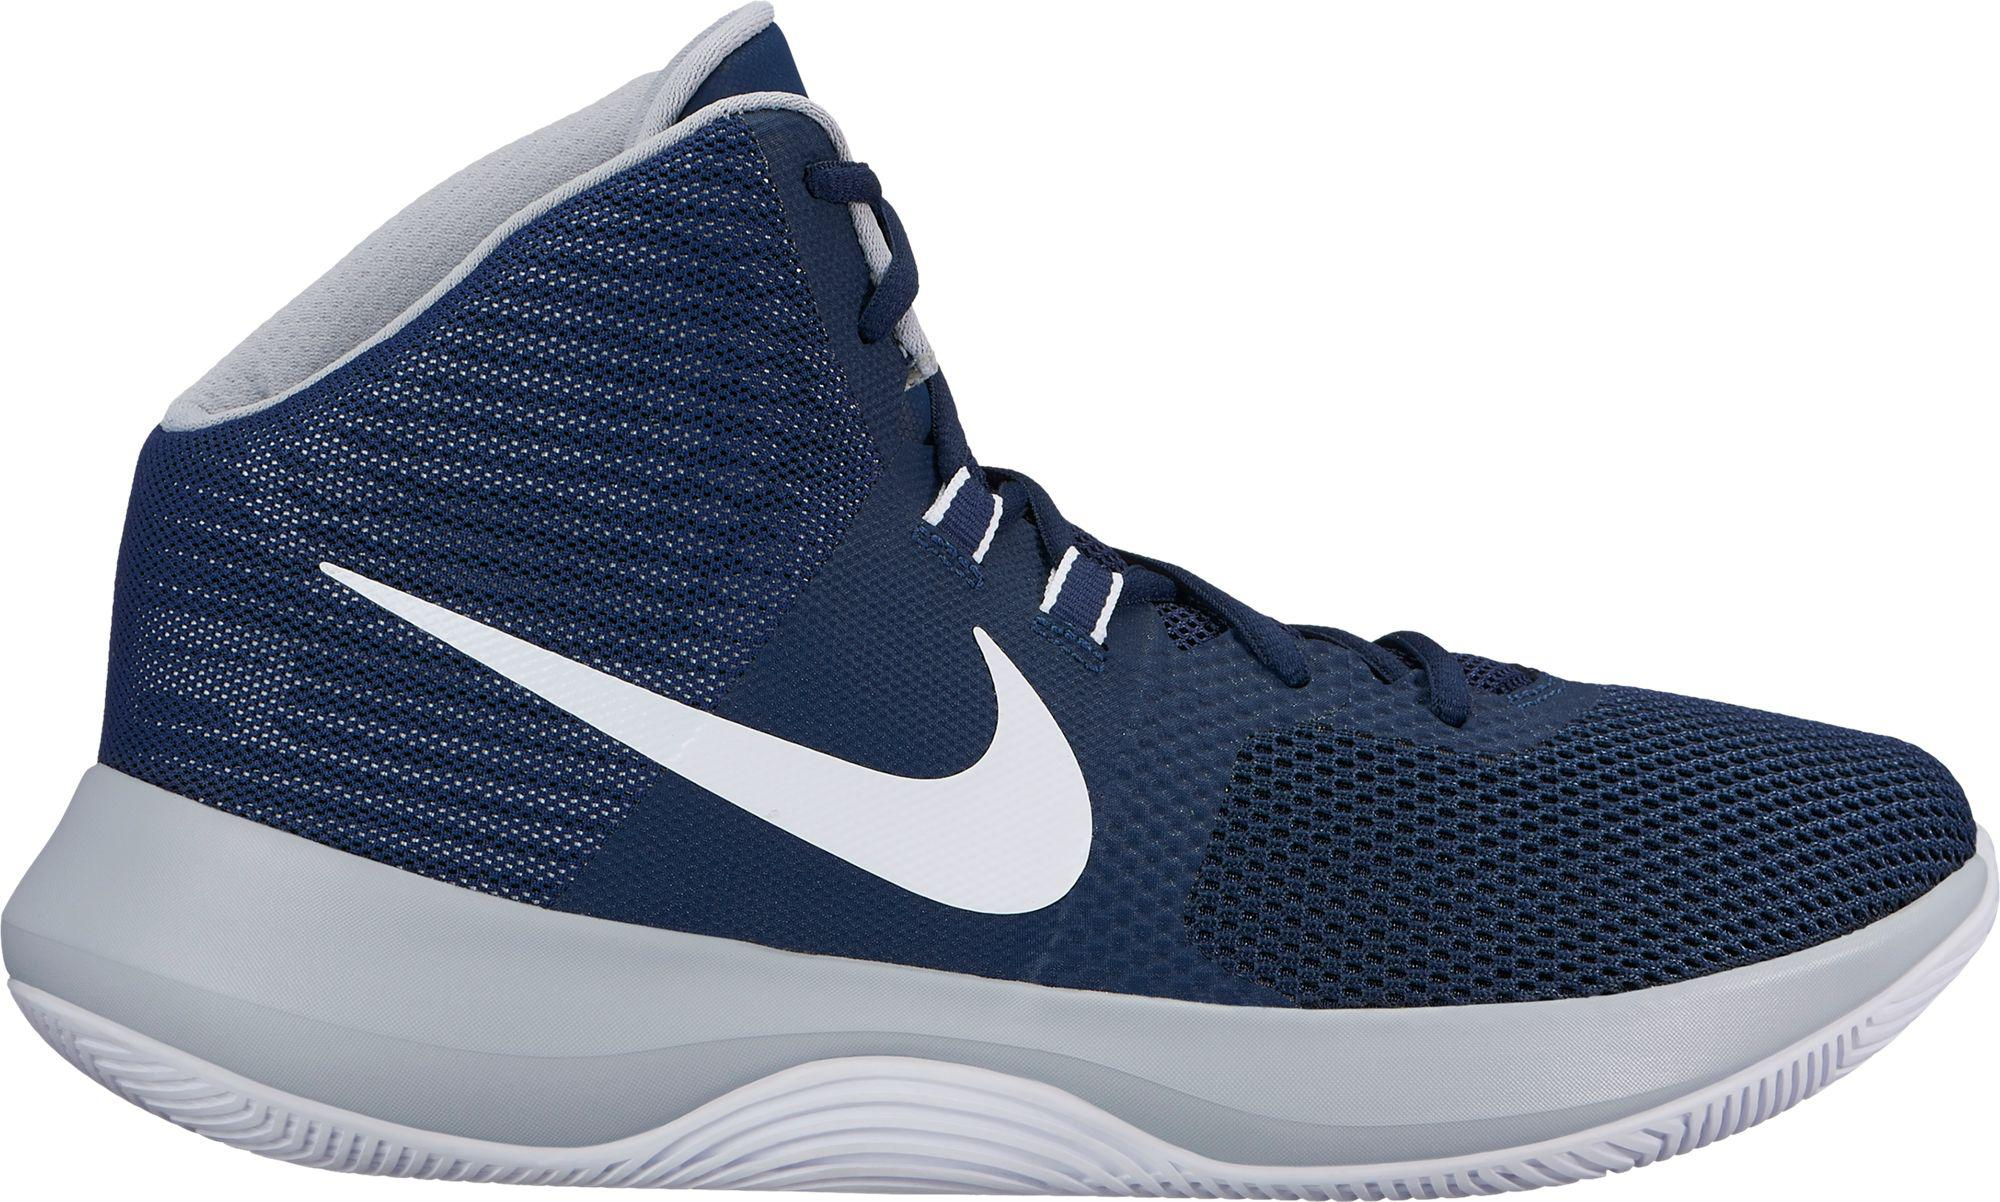 wholesale dealer 6e0db e89bd ... new arrivals nike blue air precision basketball shoes for men lyst  af75a 95106